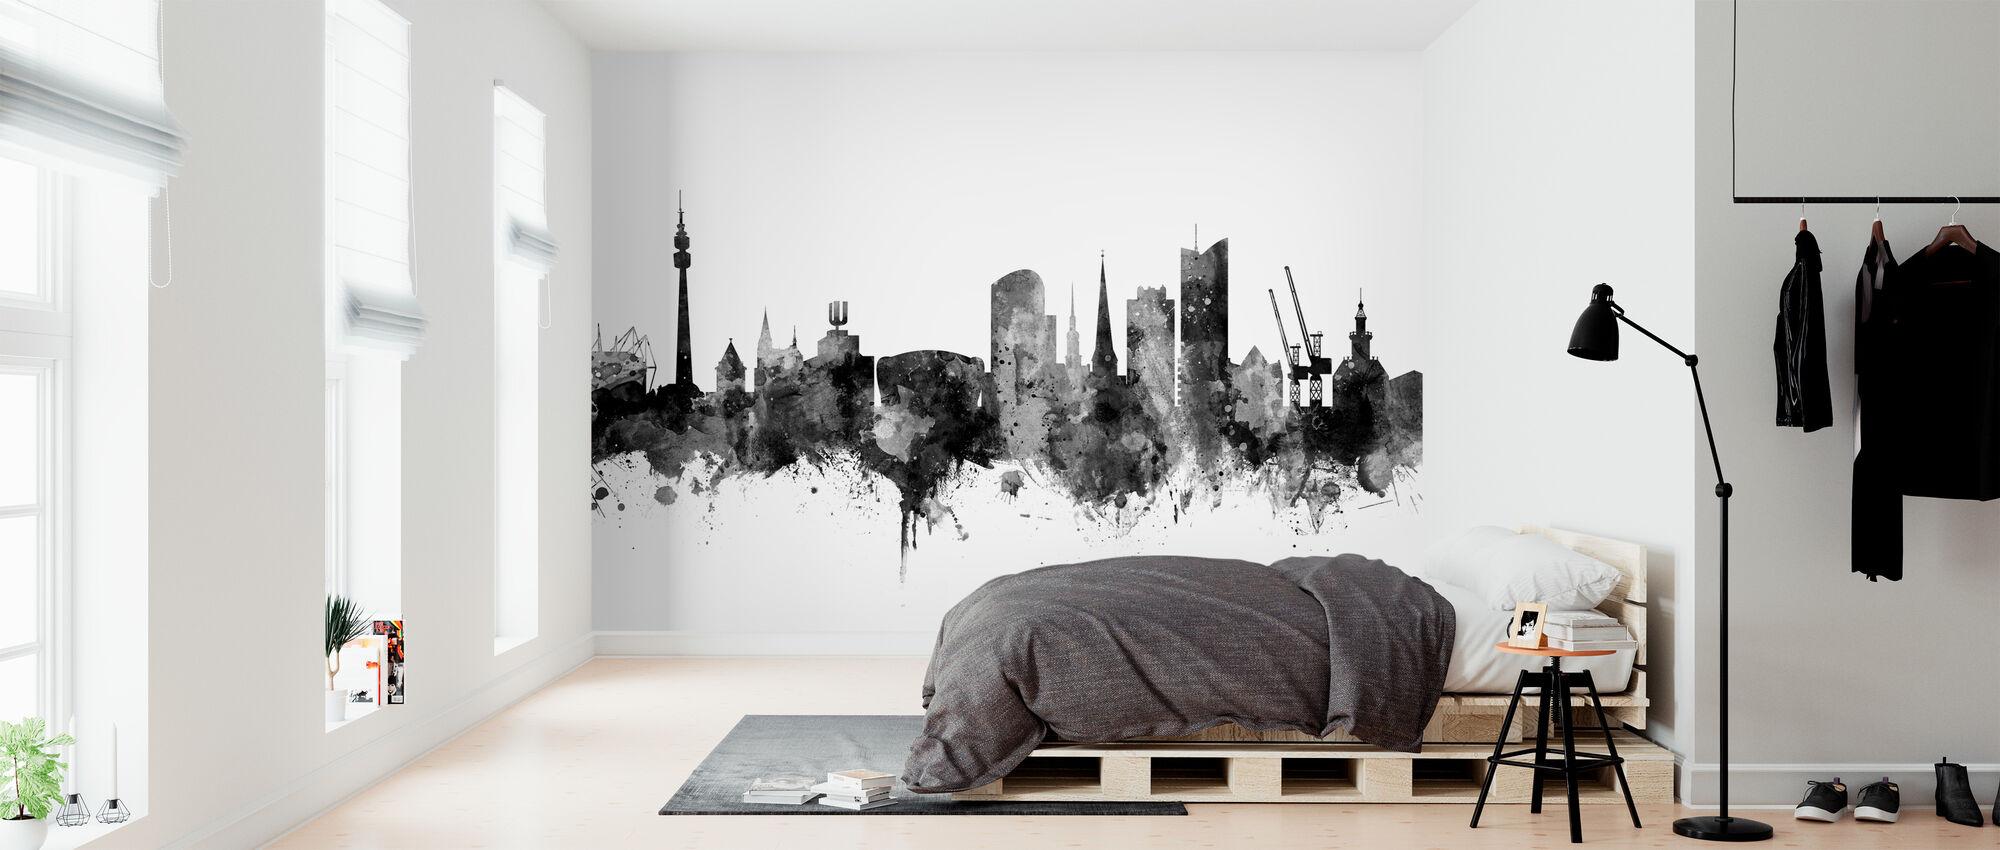 Dortmund Skyline Black - Wallpaper - Bedroom